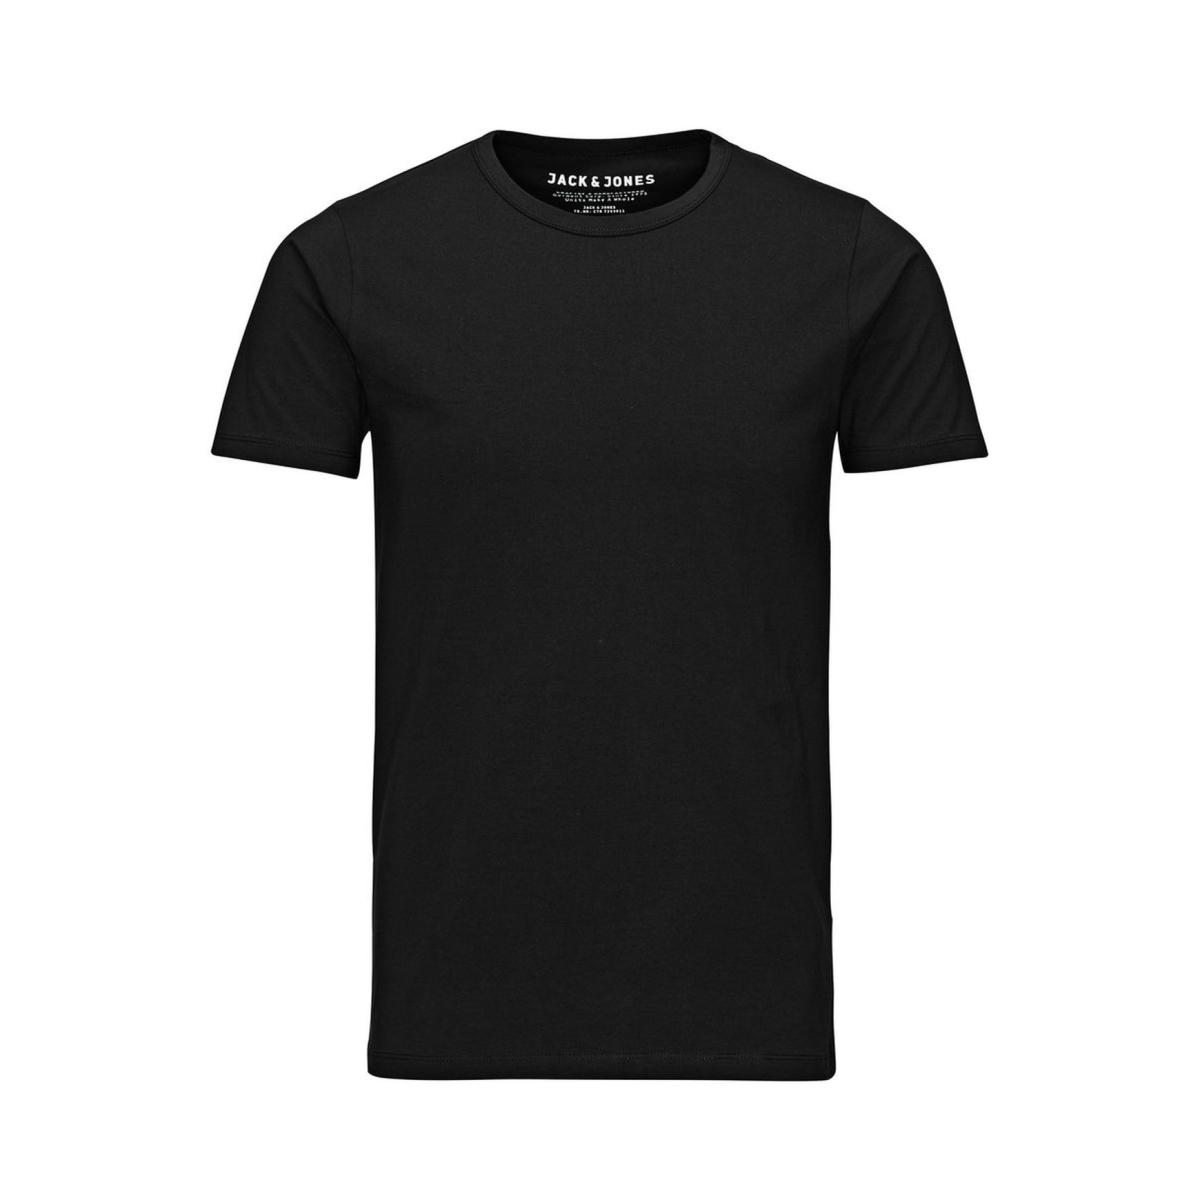 basic o-neck tee 12058529 jack & jones t-shirt black